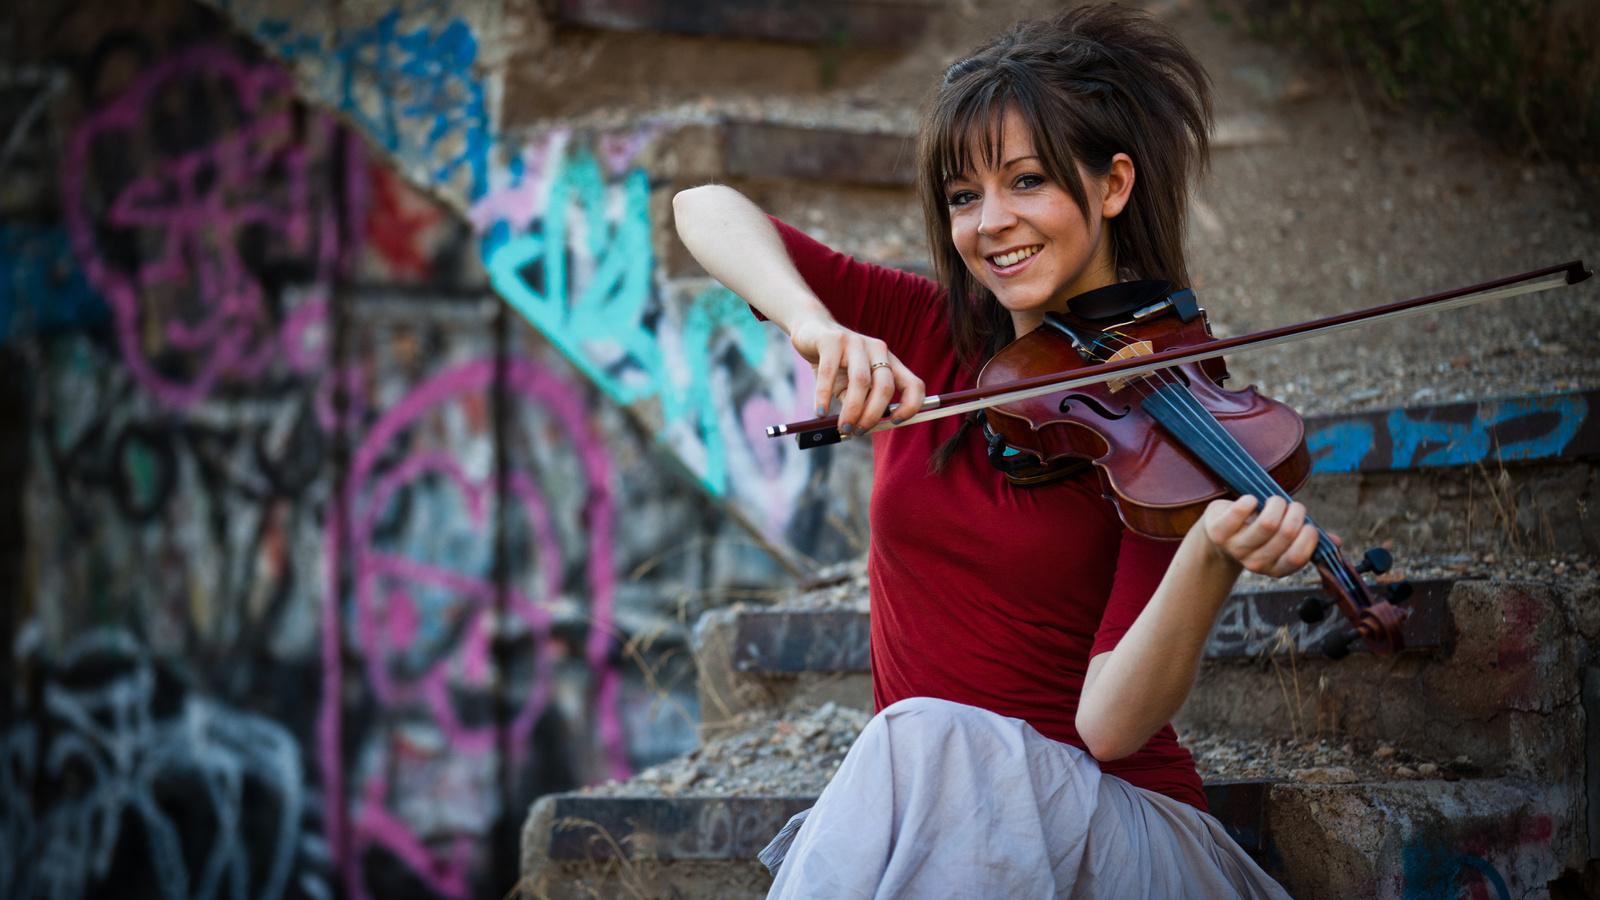 скрипка, Lindsey stirling, violin, линдси стирлинг, девушка